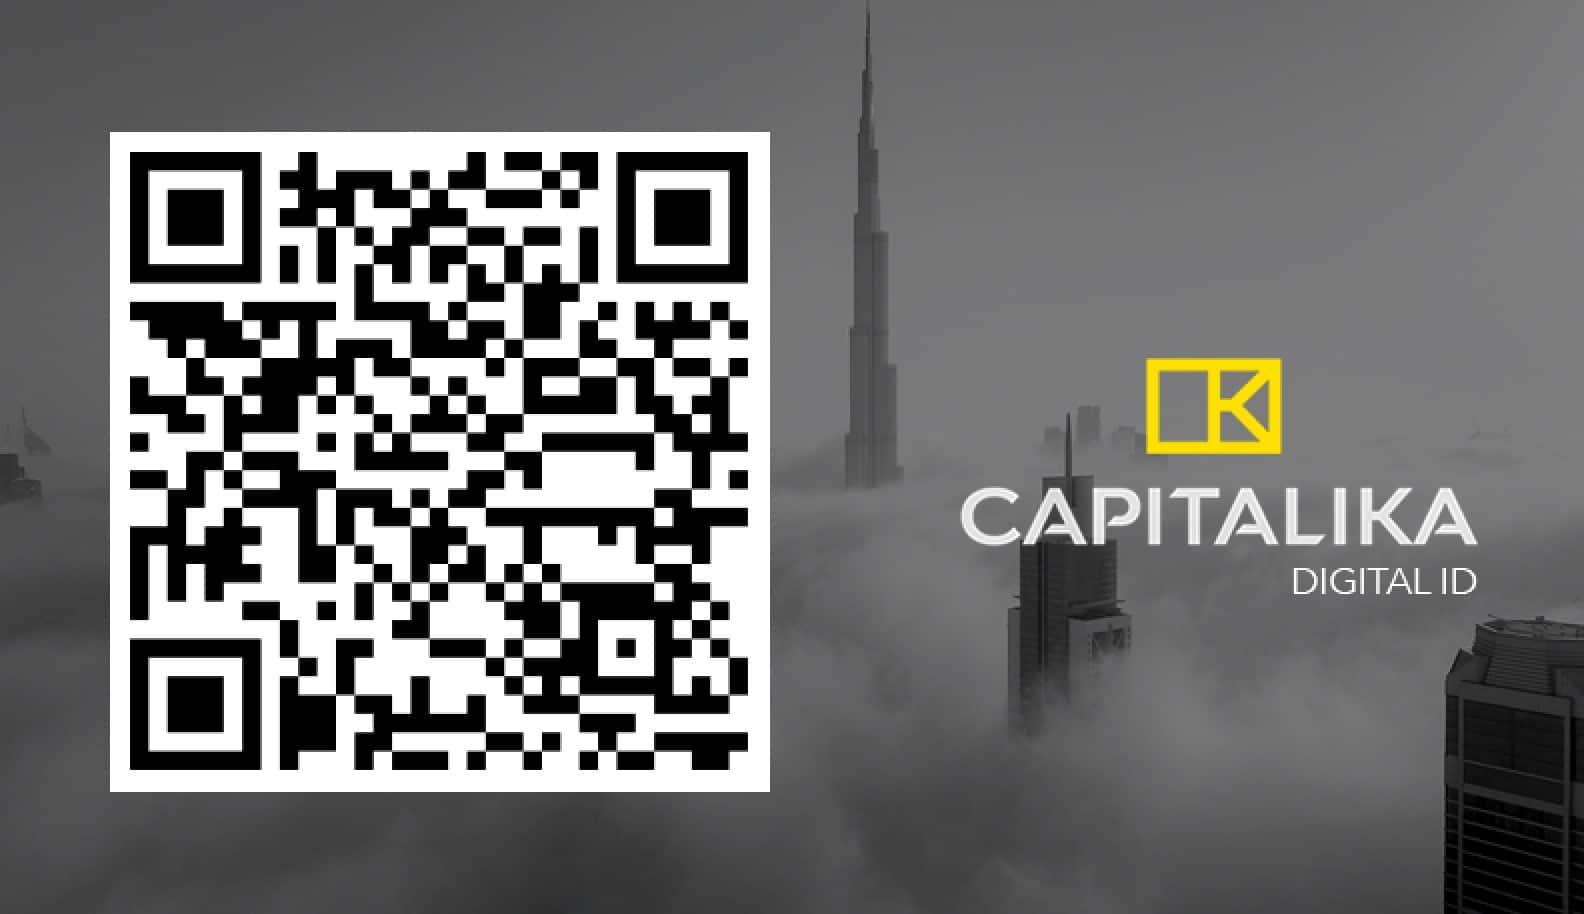 blockchain-ethereum-identidad-identificación